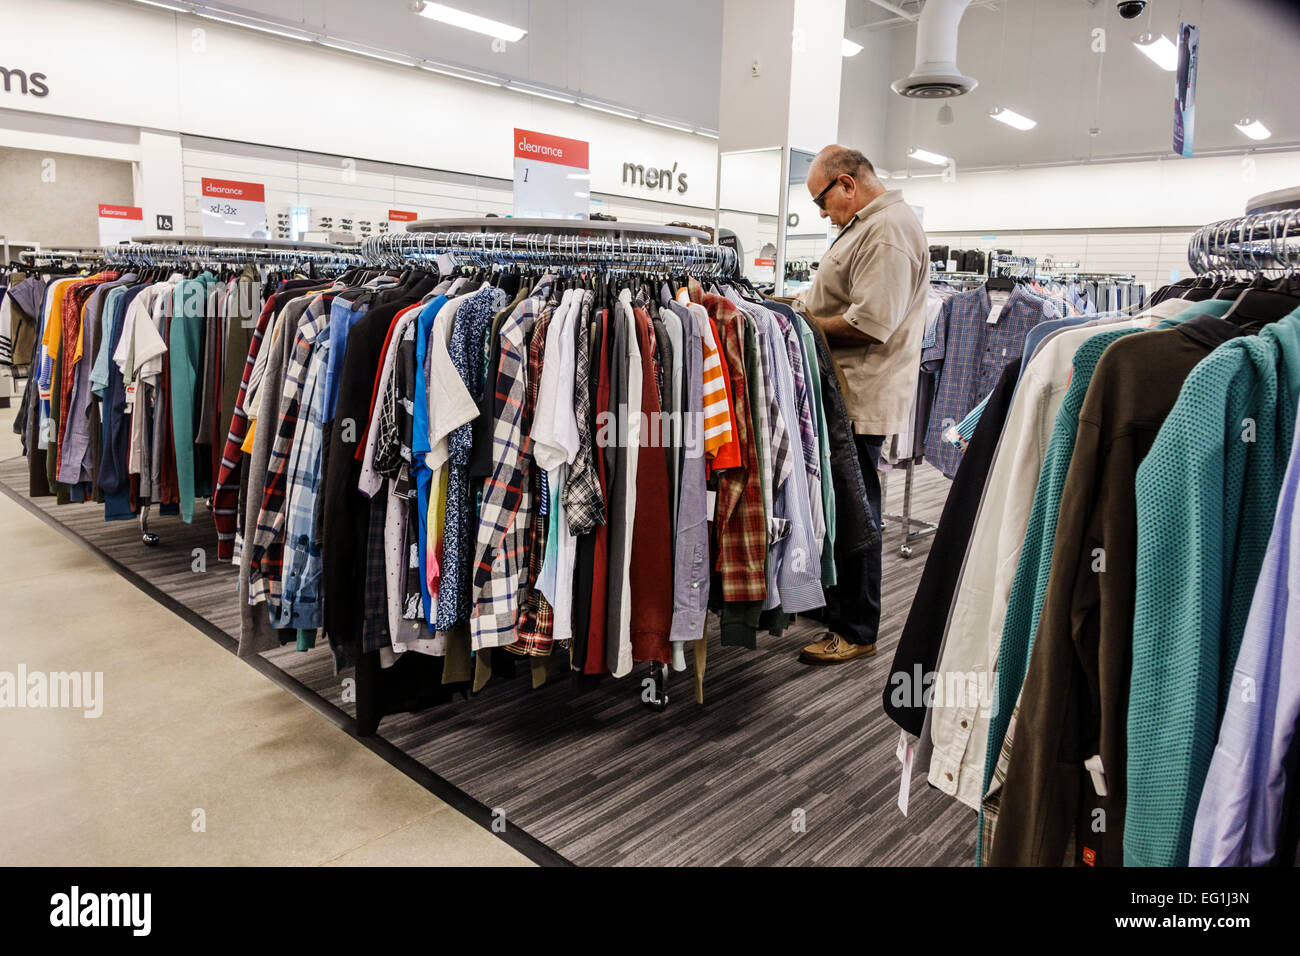 d8fdf28f8cb Nordstrom Rack Stock Photos Nordstrom Rack Stock Images